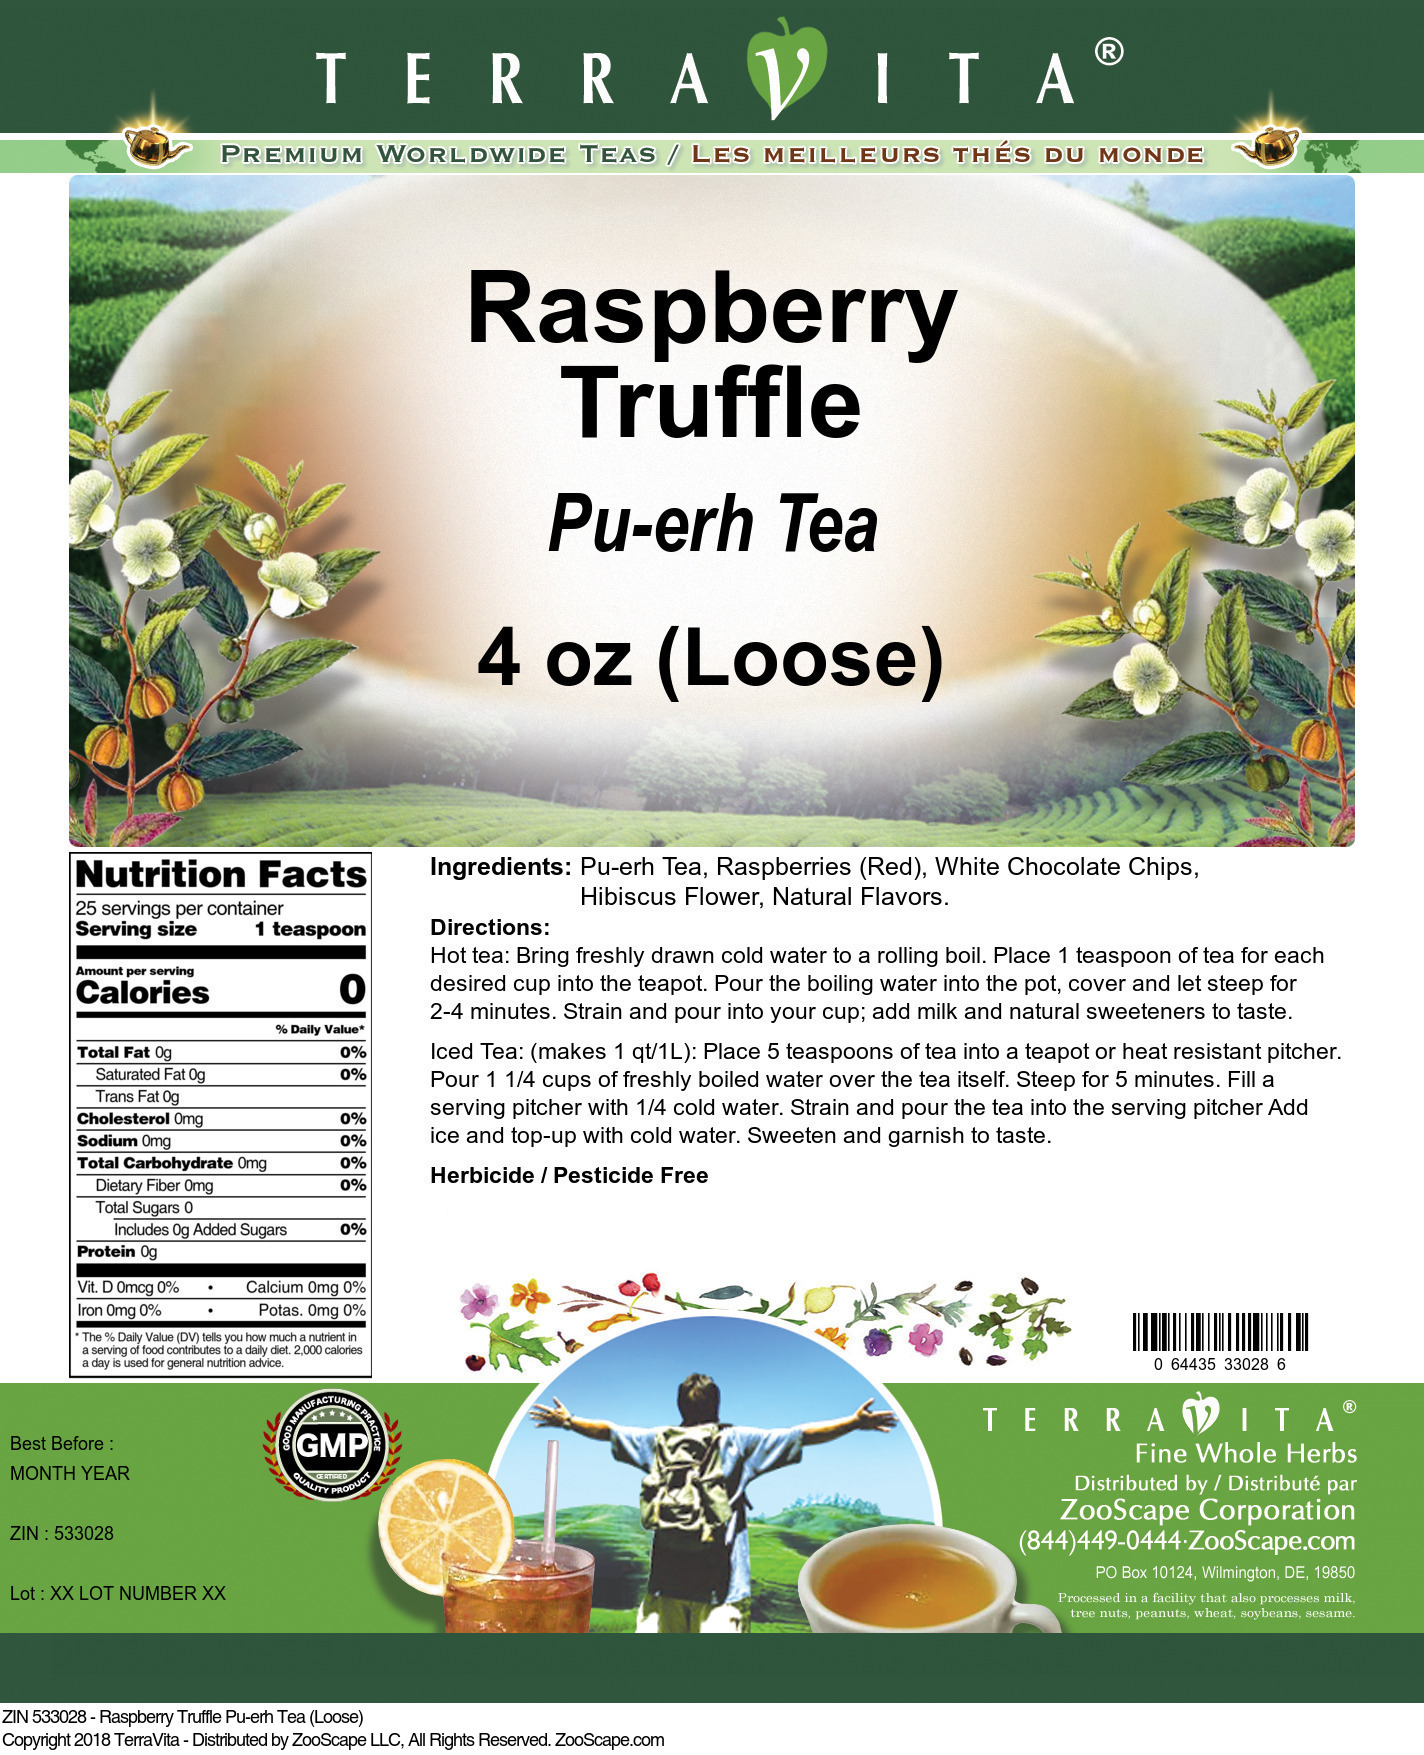 Raspberry Truffle Pu-erh Tea (Loose)